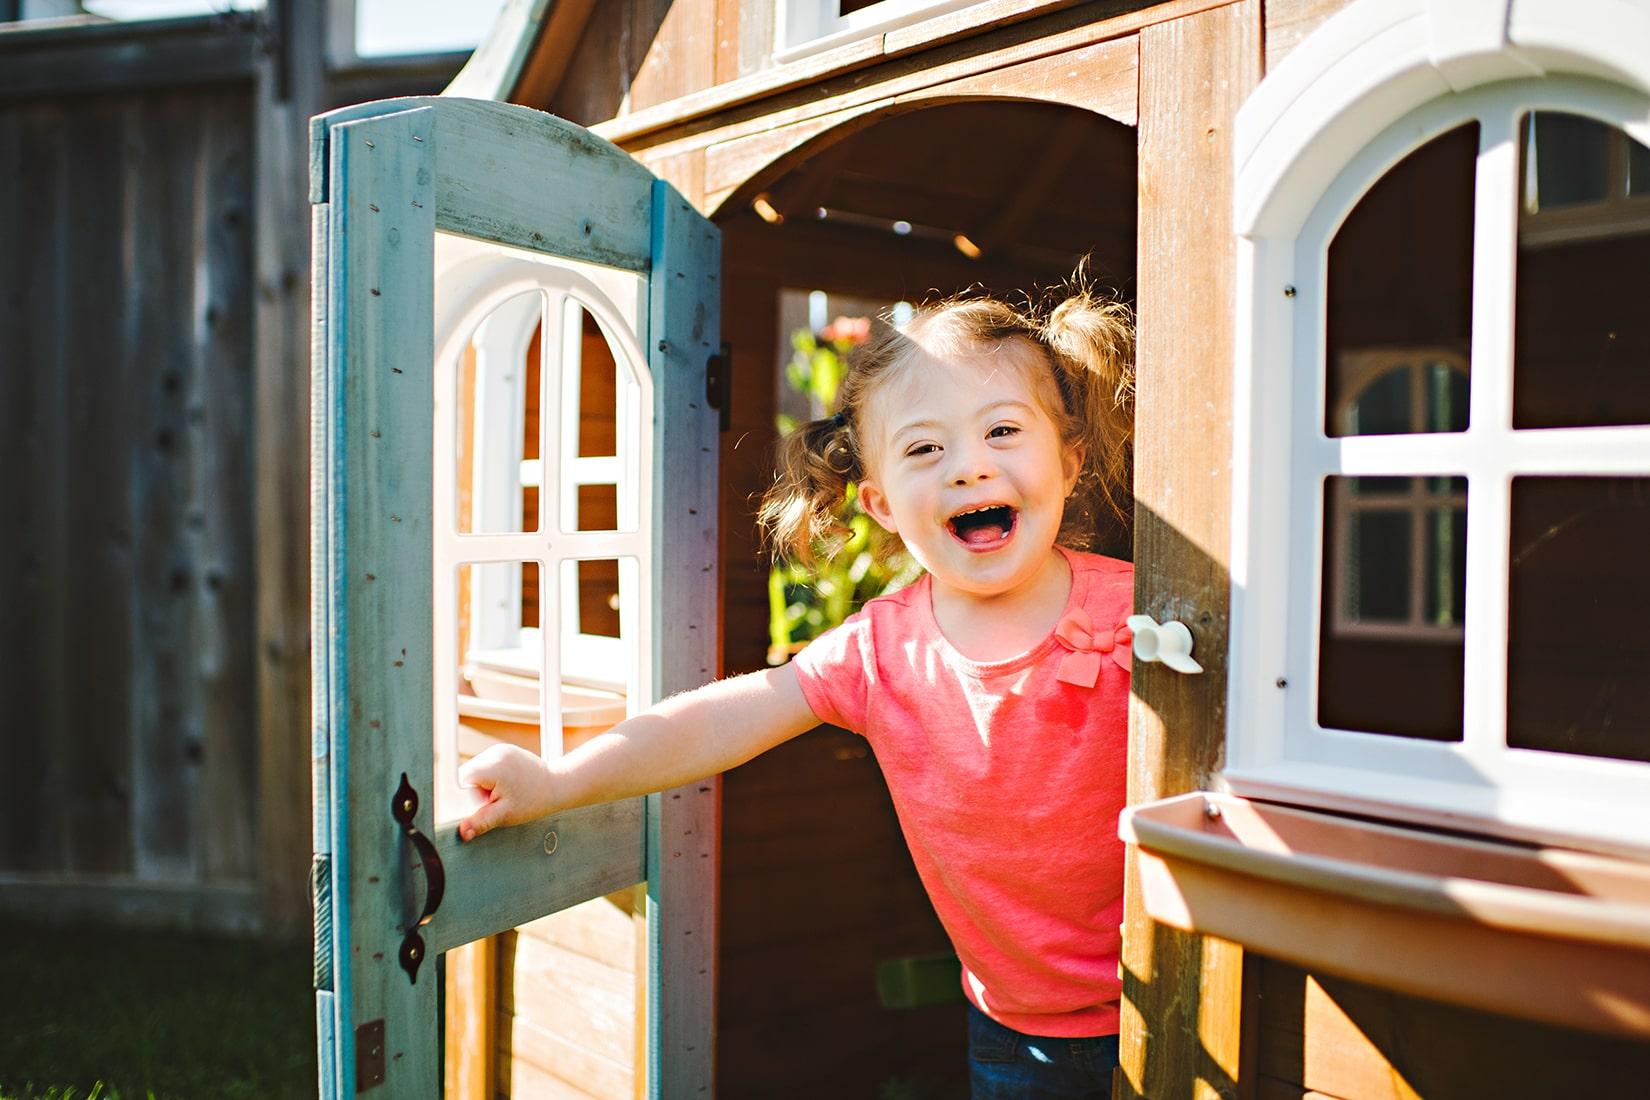 Girl in playhouse